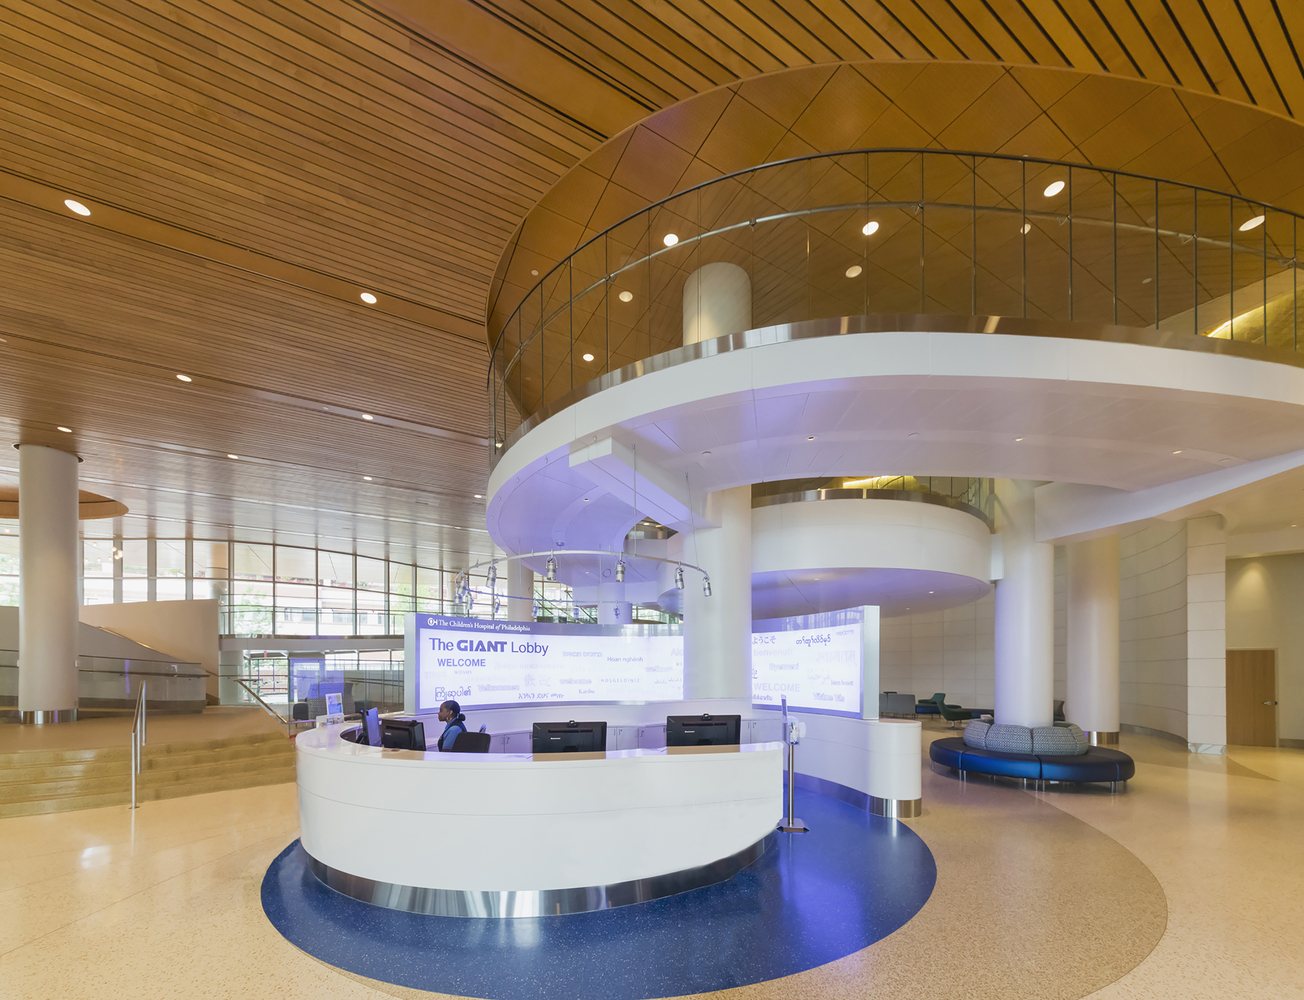 Buerger Center for Advanced Pediatric Care, Children's Hospital of Philadelphia, Location: Philadelphia, Pennsylvania, Architect: Pelli Clarke Pelli